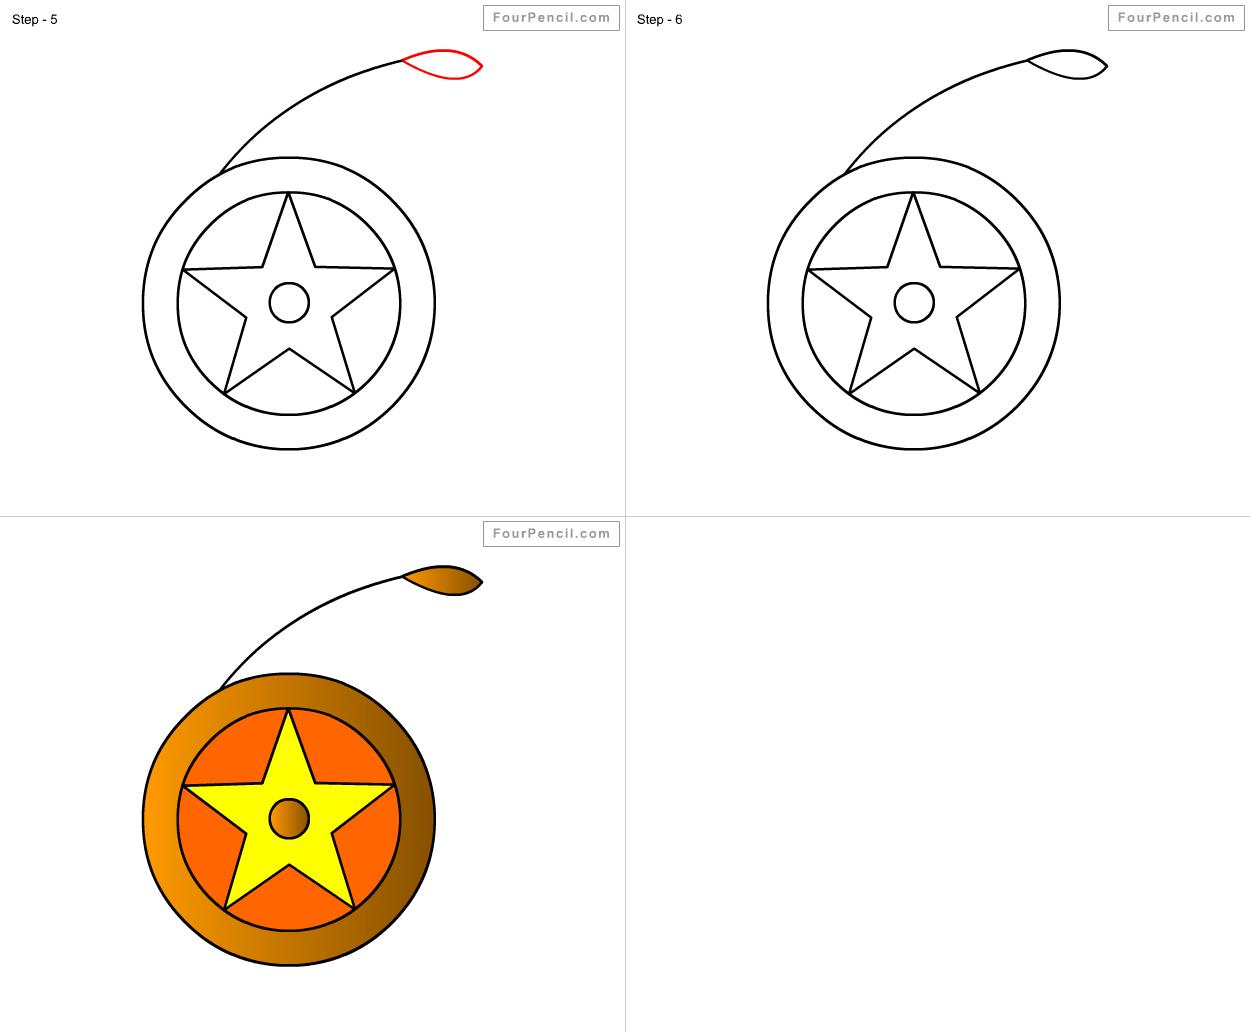 How To Draw Yoyo For Kids Step By Step Drawing Tutorial, Draw Yo